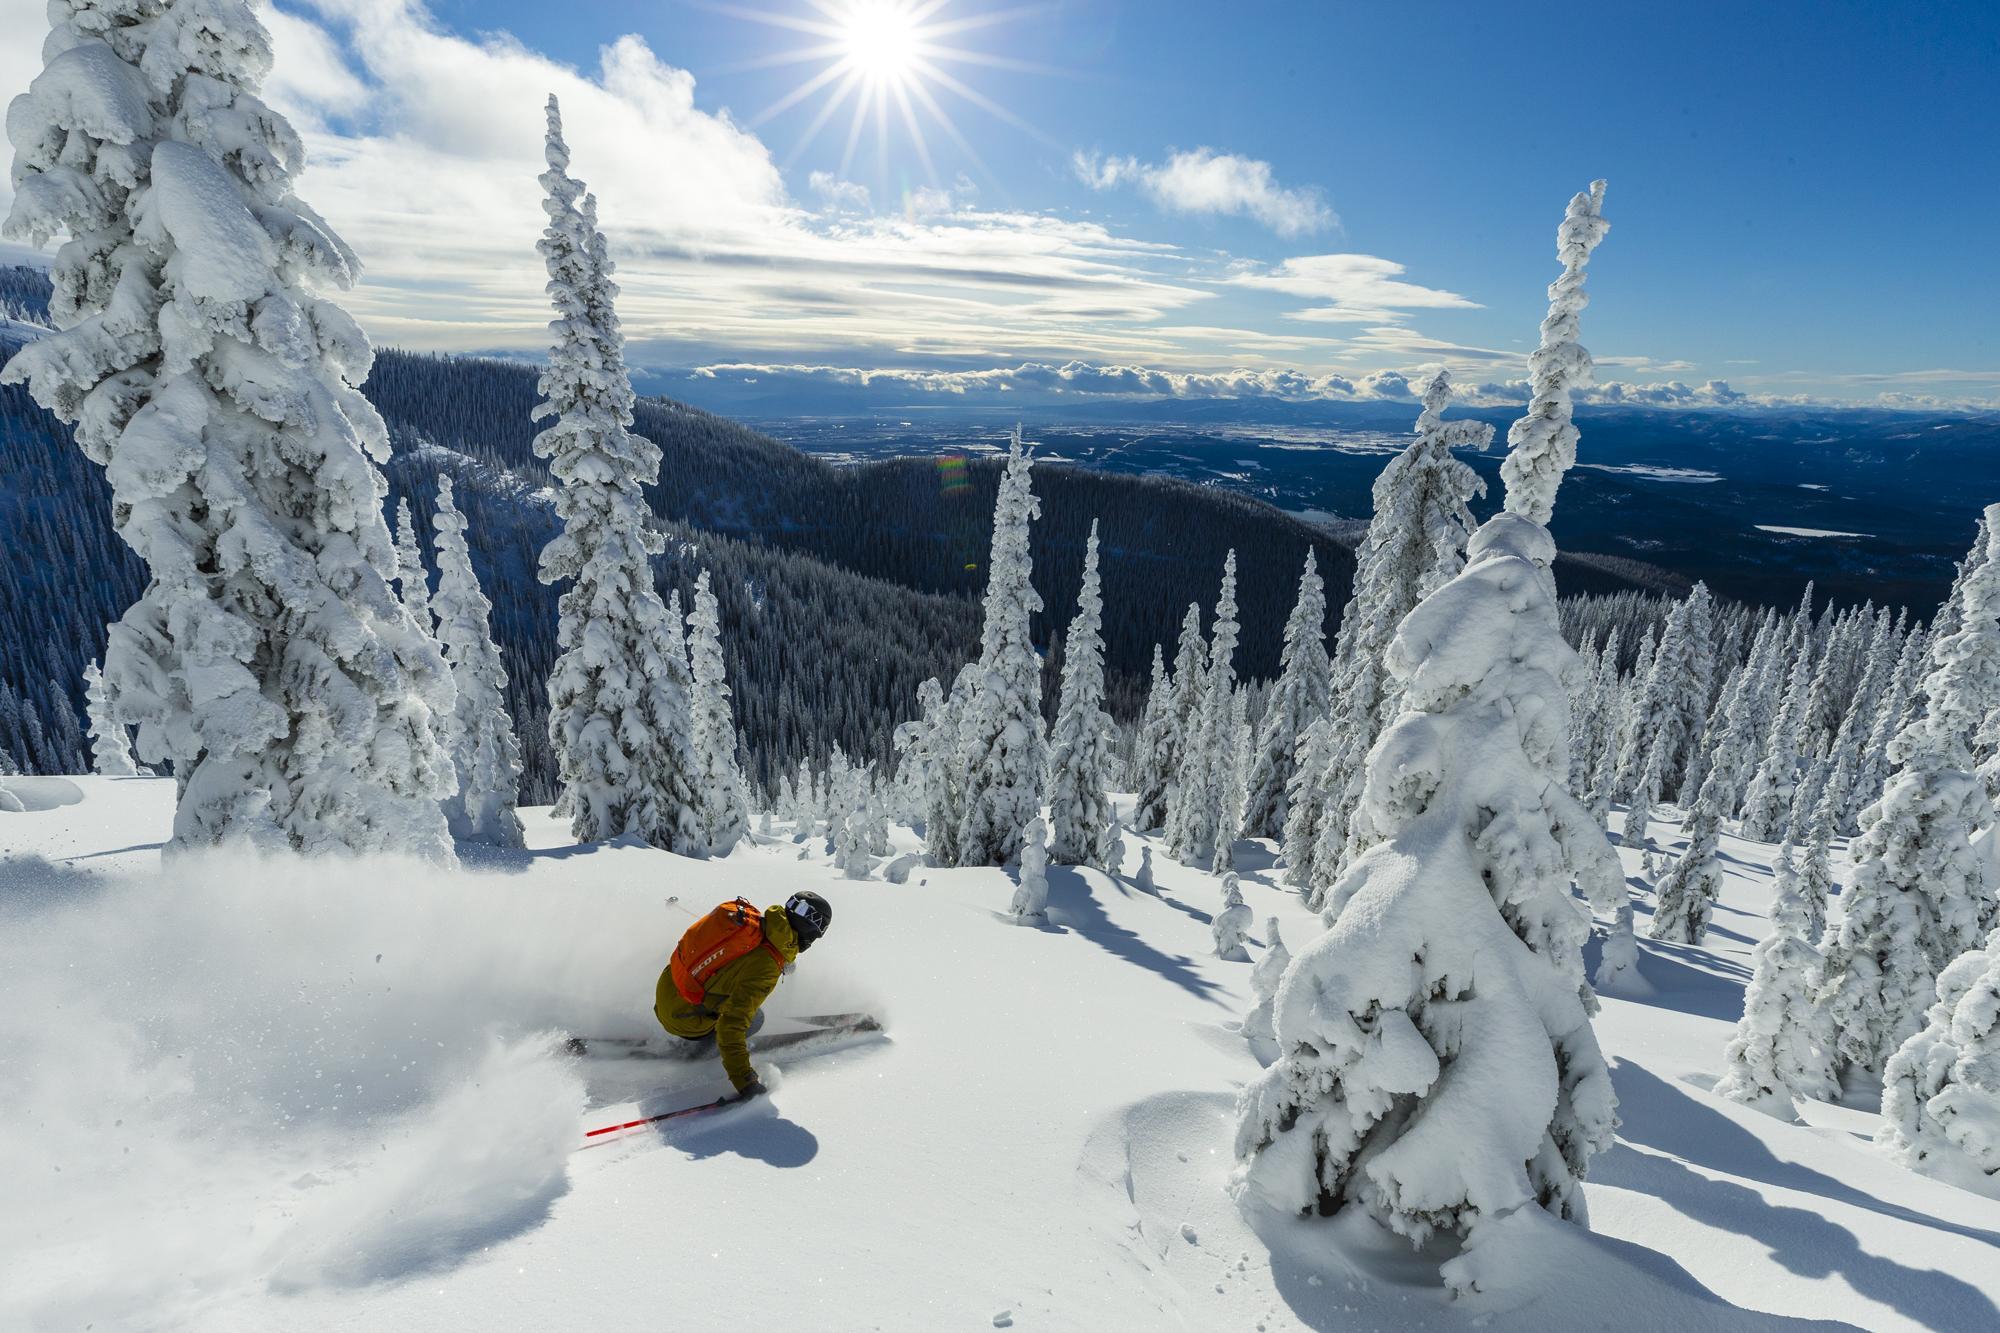 Skiing at Whitefish Mountain Resort // Photo: Grant Gunderson